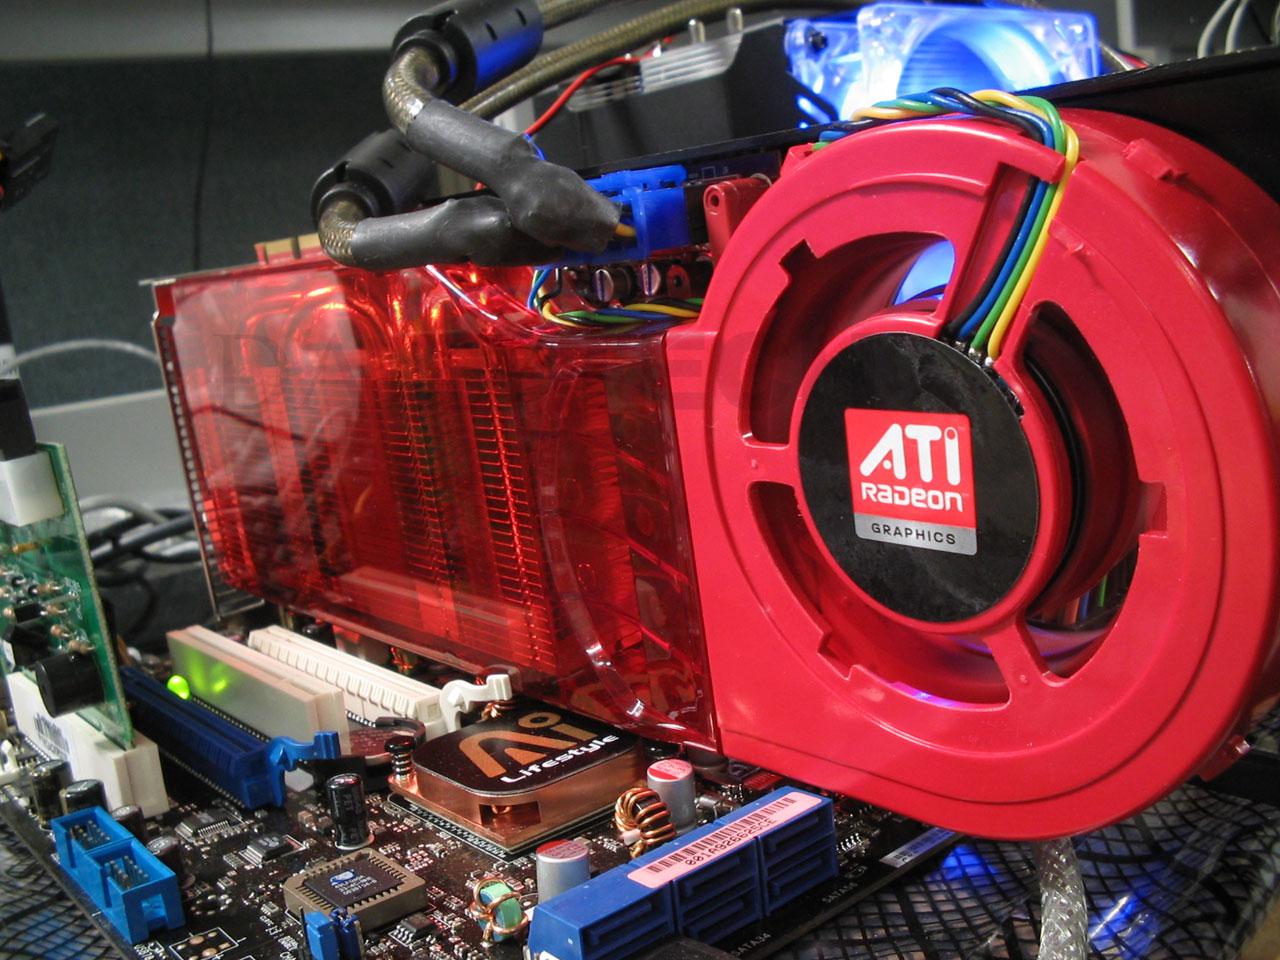 News Posts Matching Geforce 8800 Techpowerup Vga Pci 256 Mb Ddr2 8400gs 8300gs Nvidia Gtx Beats Amd Ati Radeon Hd 2900 Xtx